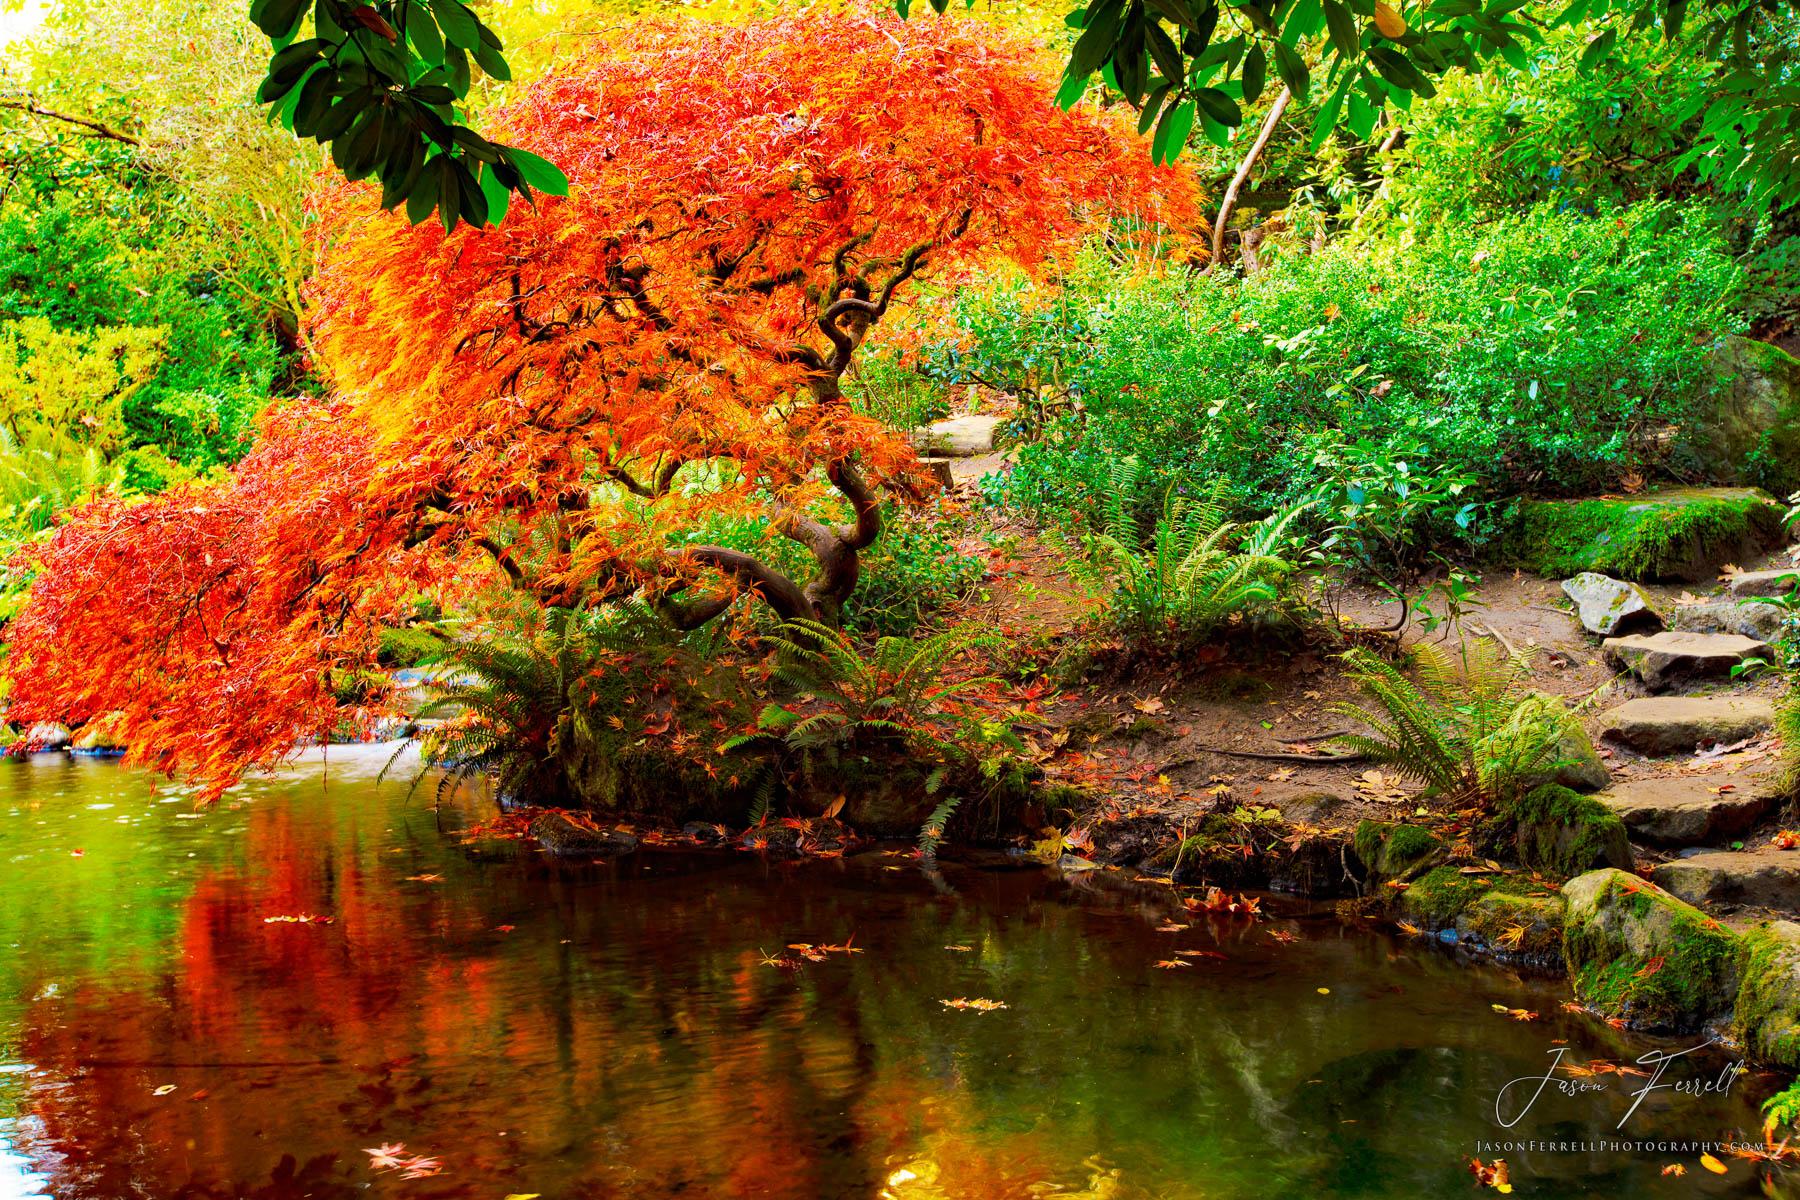 on golden pond, kubota garden, seattle, washington, japanese maple tree, reflection, water, pond, branches, photo